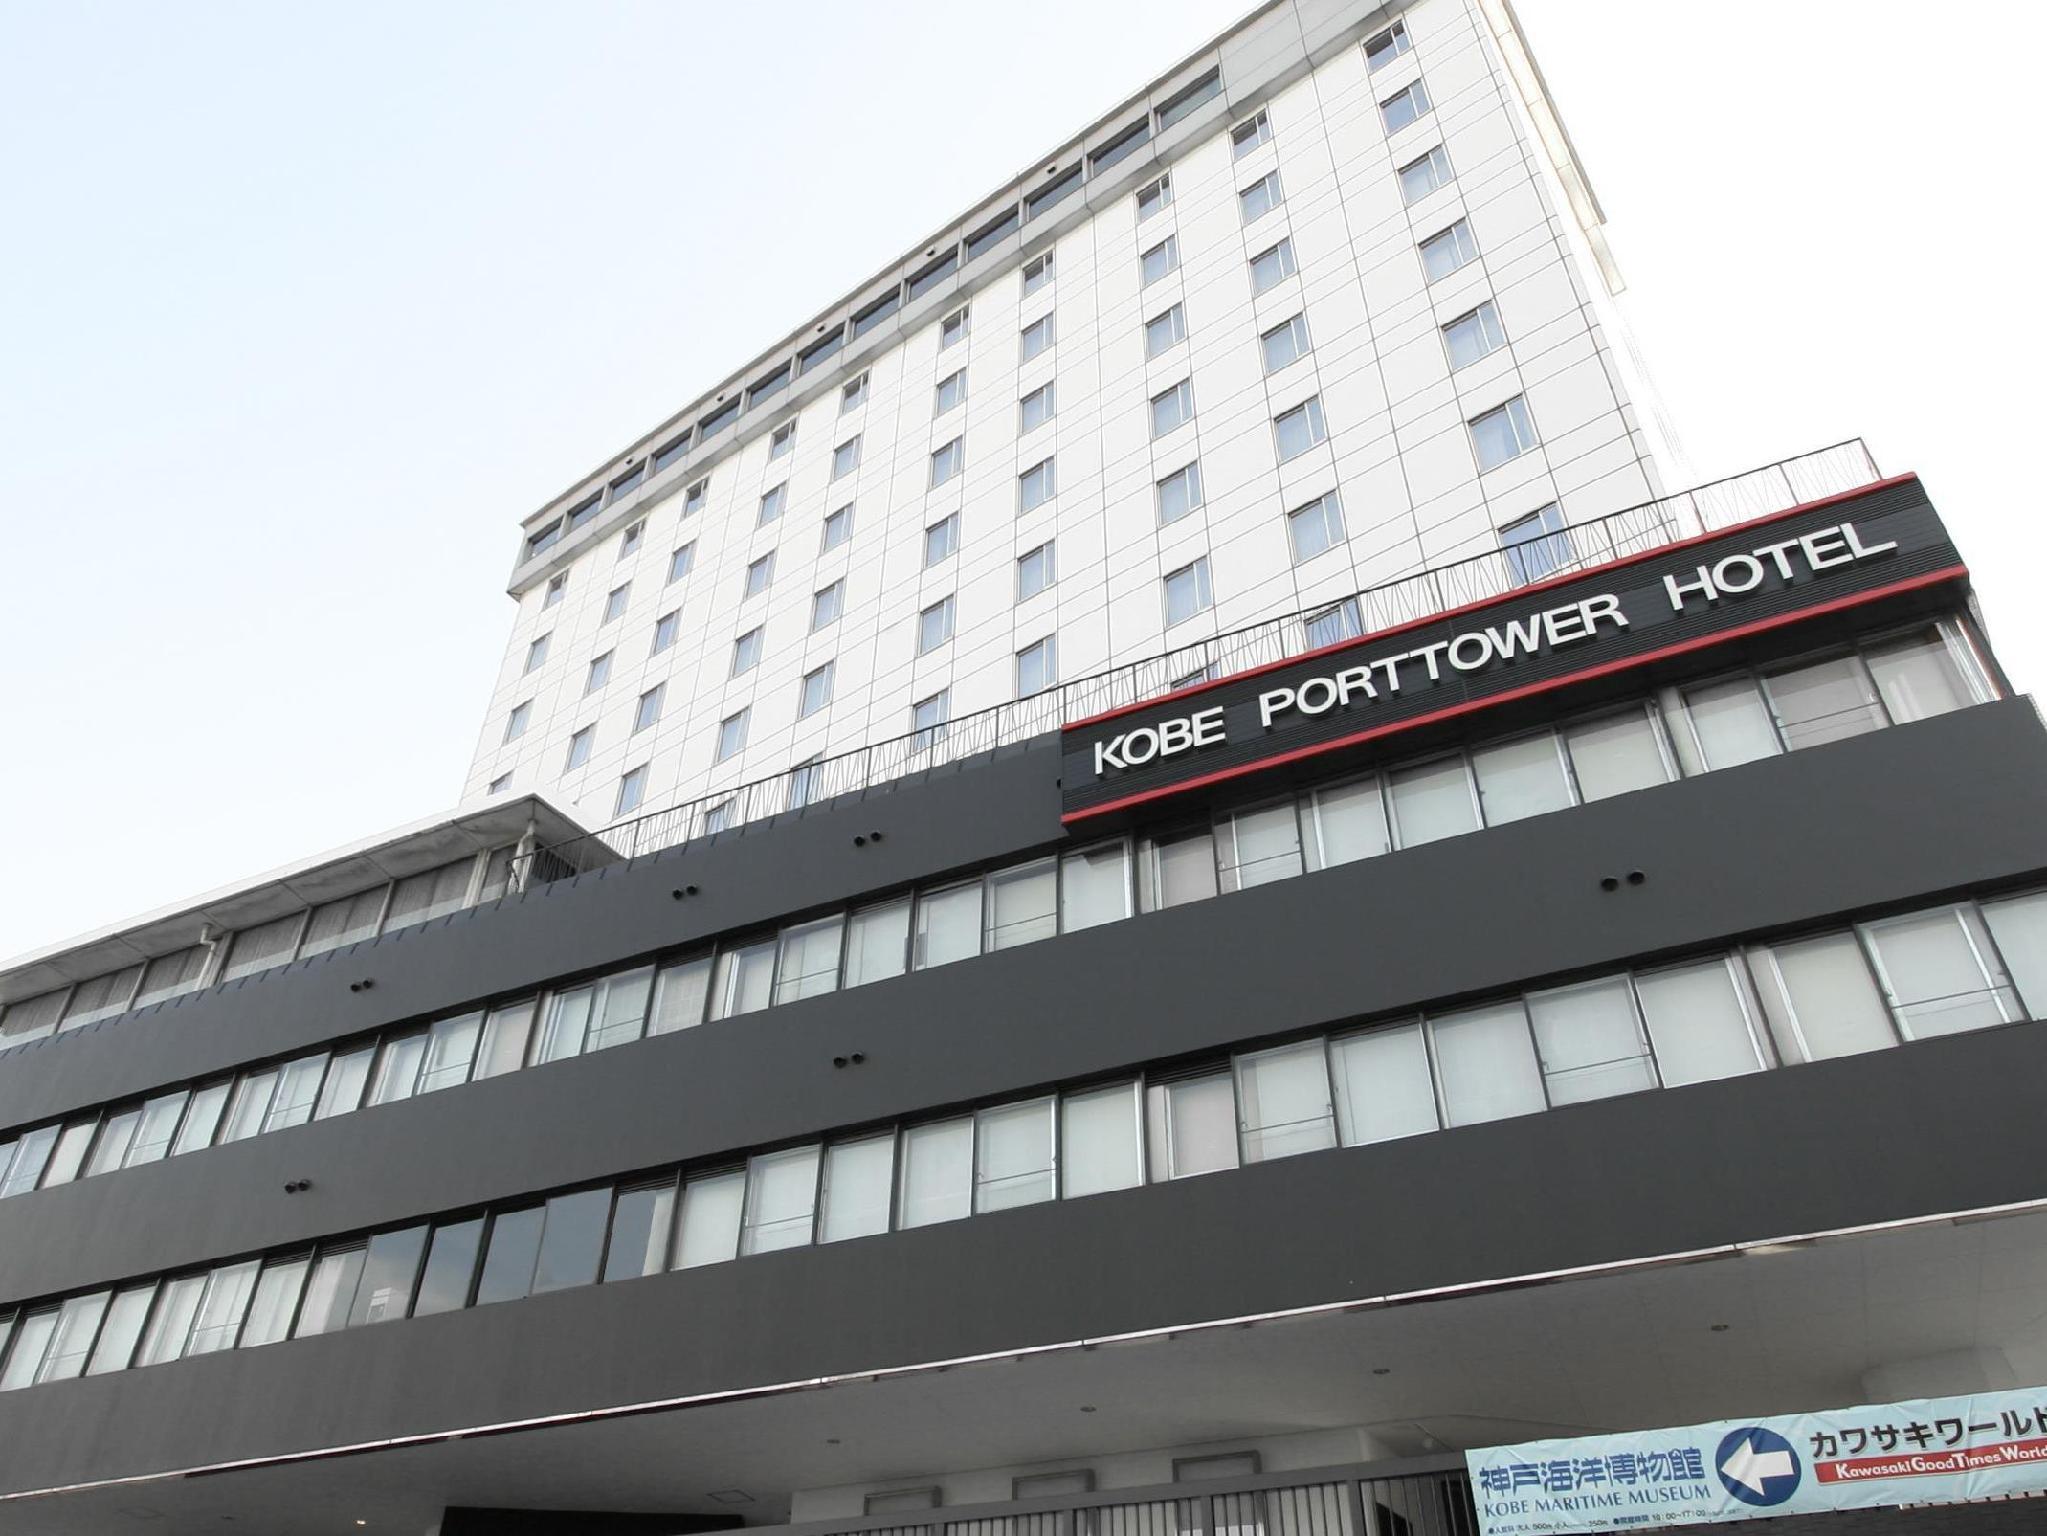 Kobe Port Tower Hotel - Nagomi no Yuyado